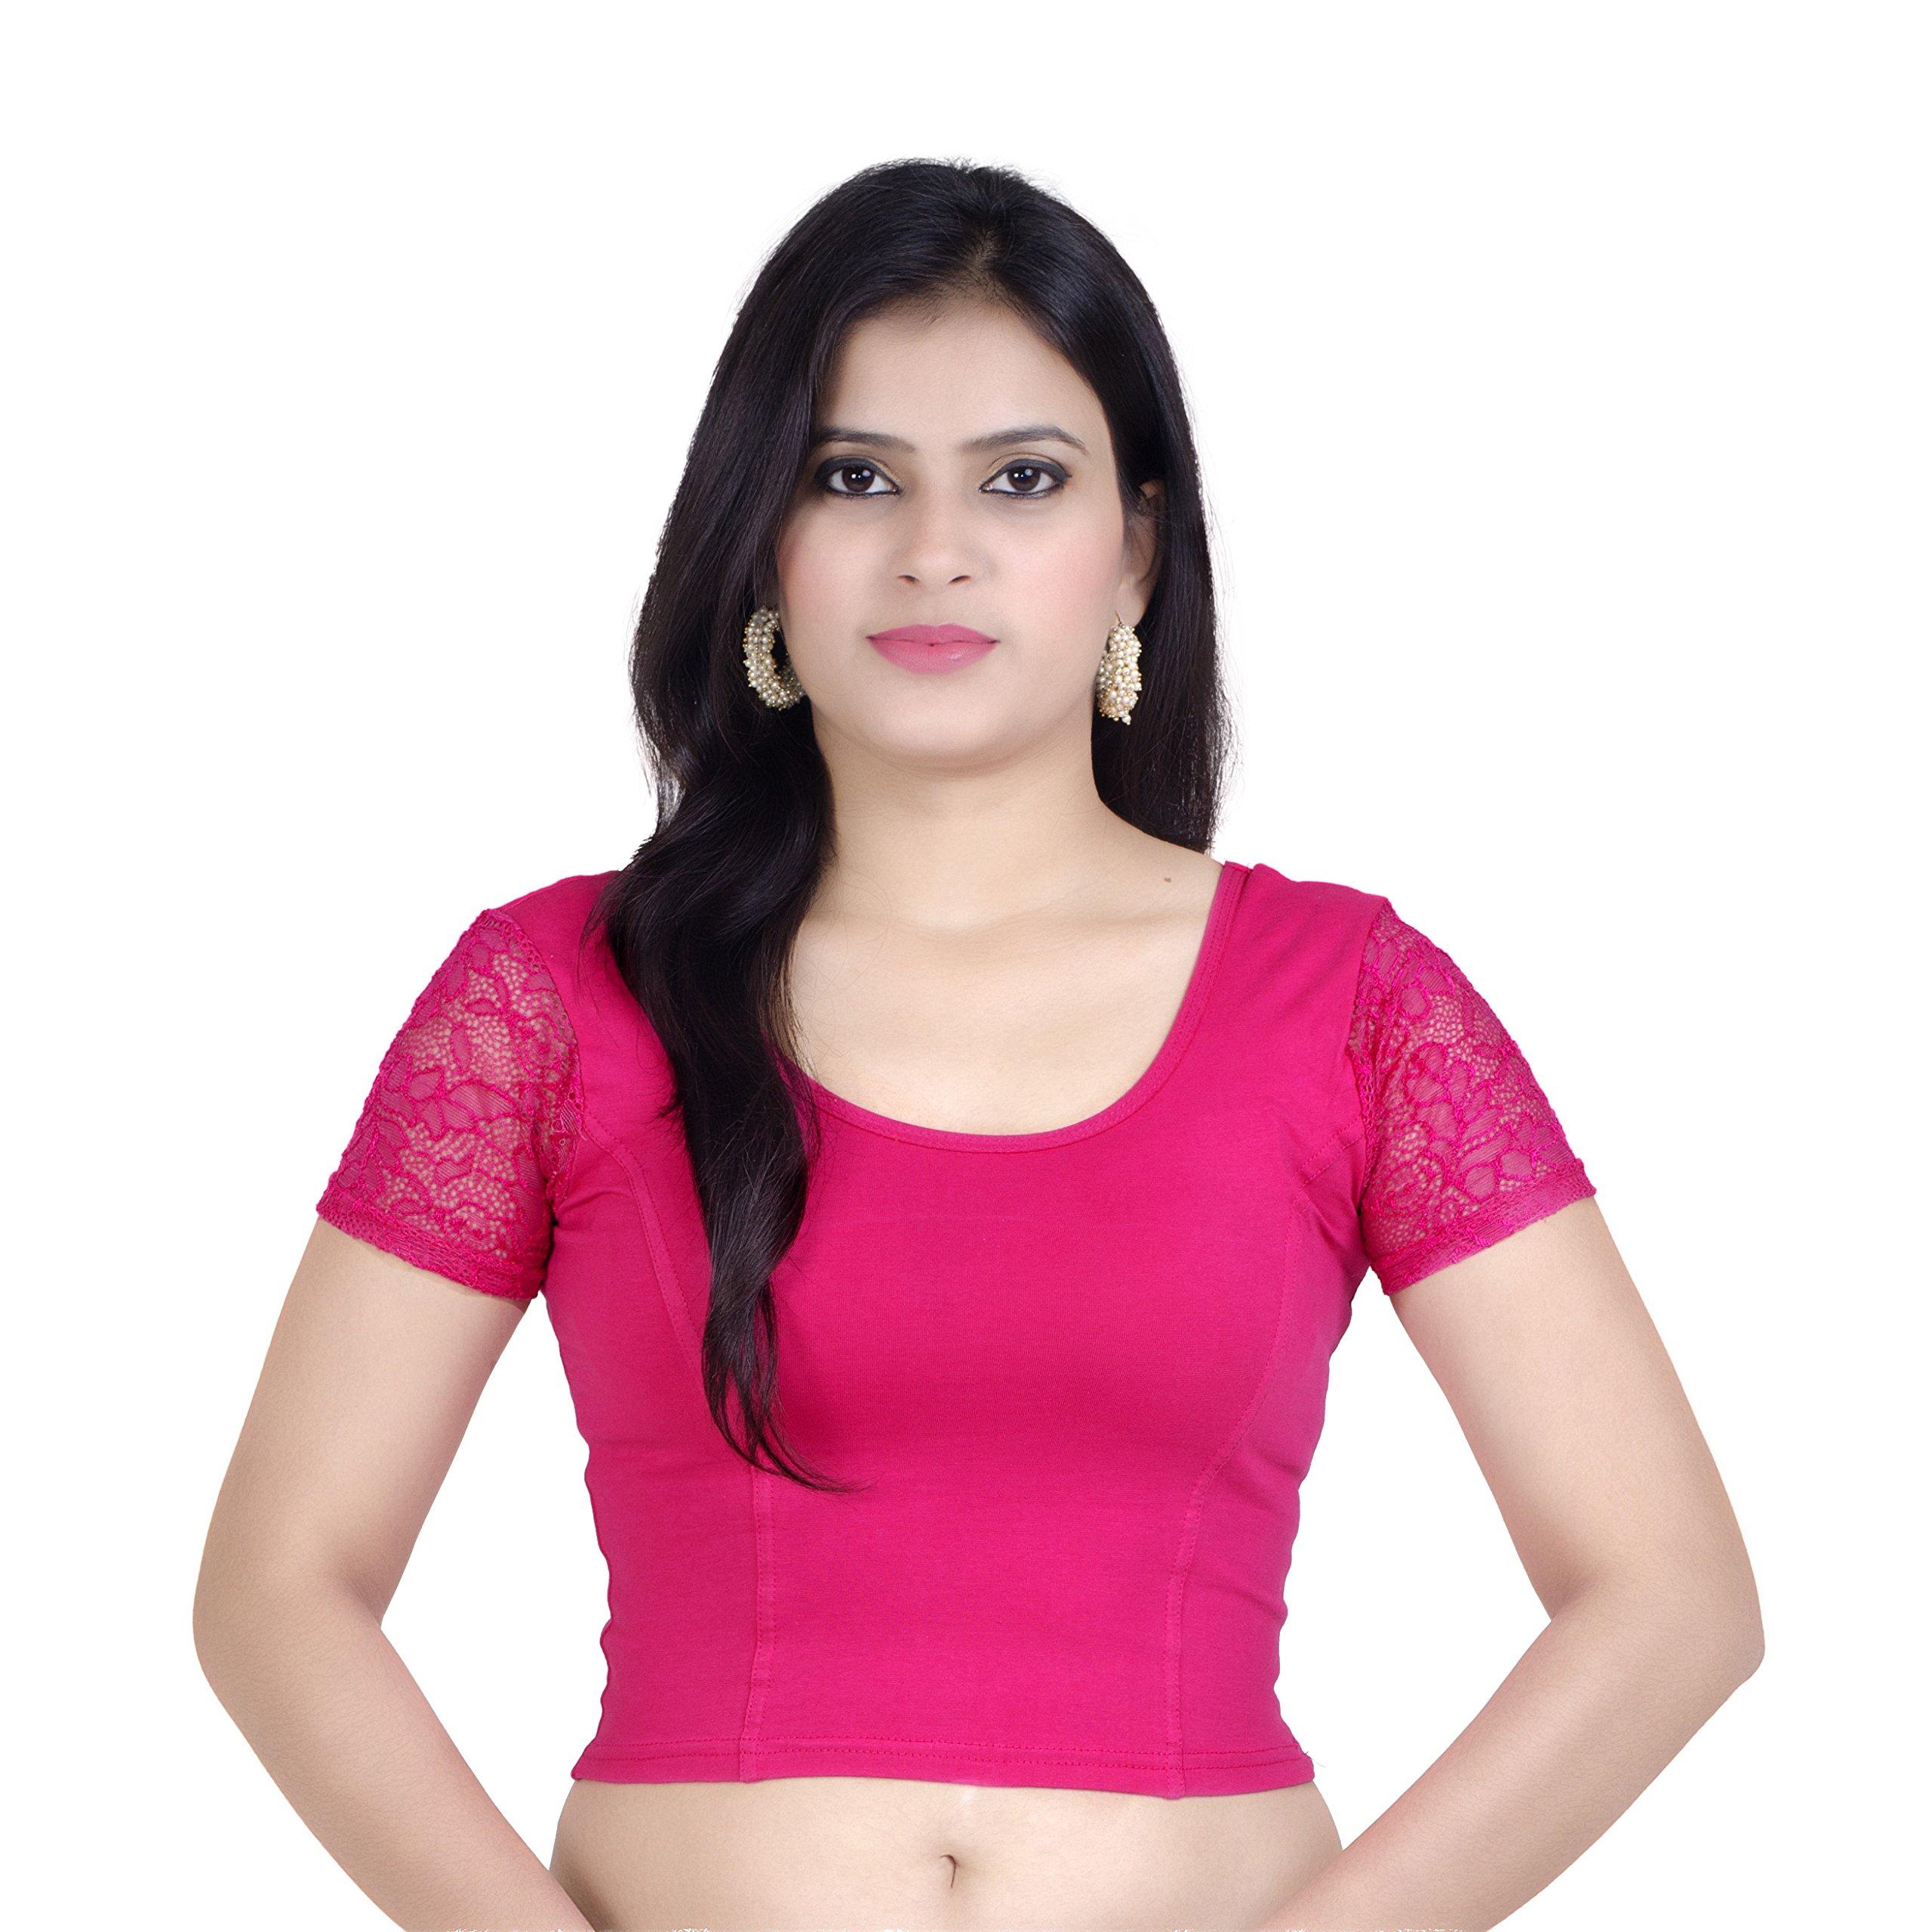 Chandrakala Womens Stretchable Readymade Pink Saree Blouse Crop Top Choli,Pink,Free Size